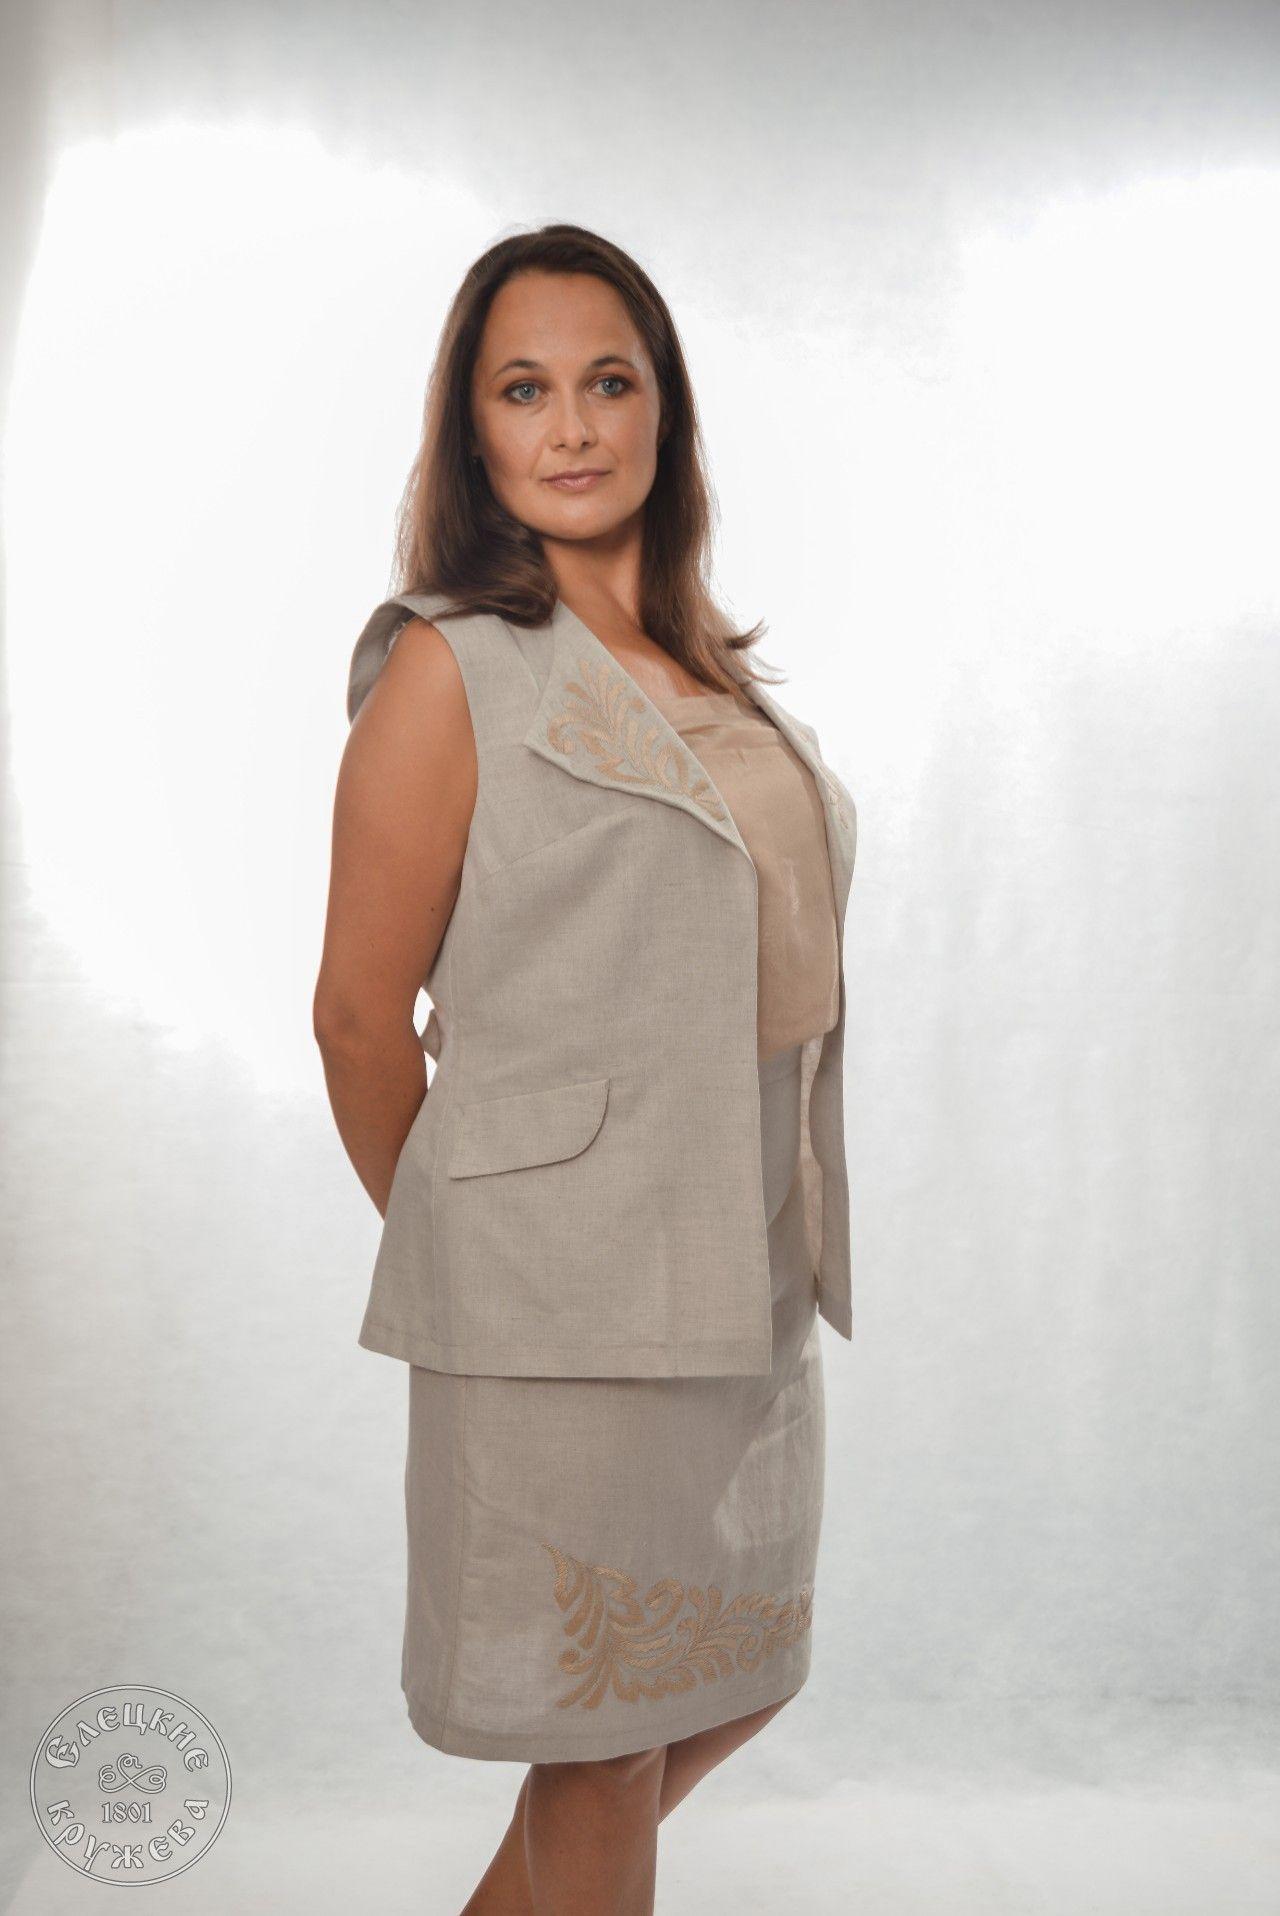 Yelets lace / Women's linen skirt С11727